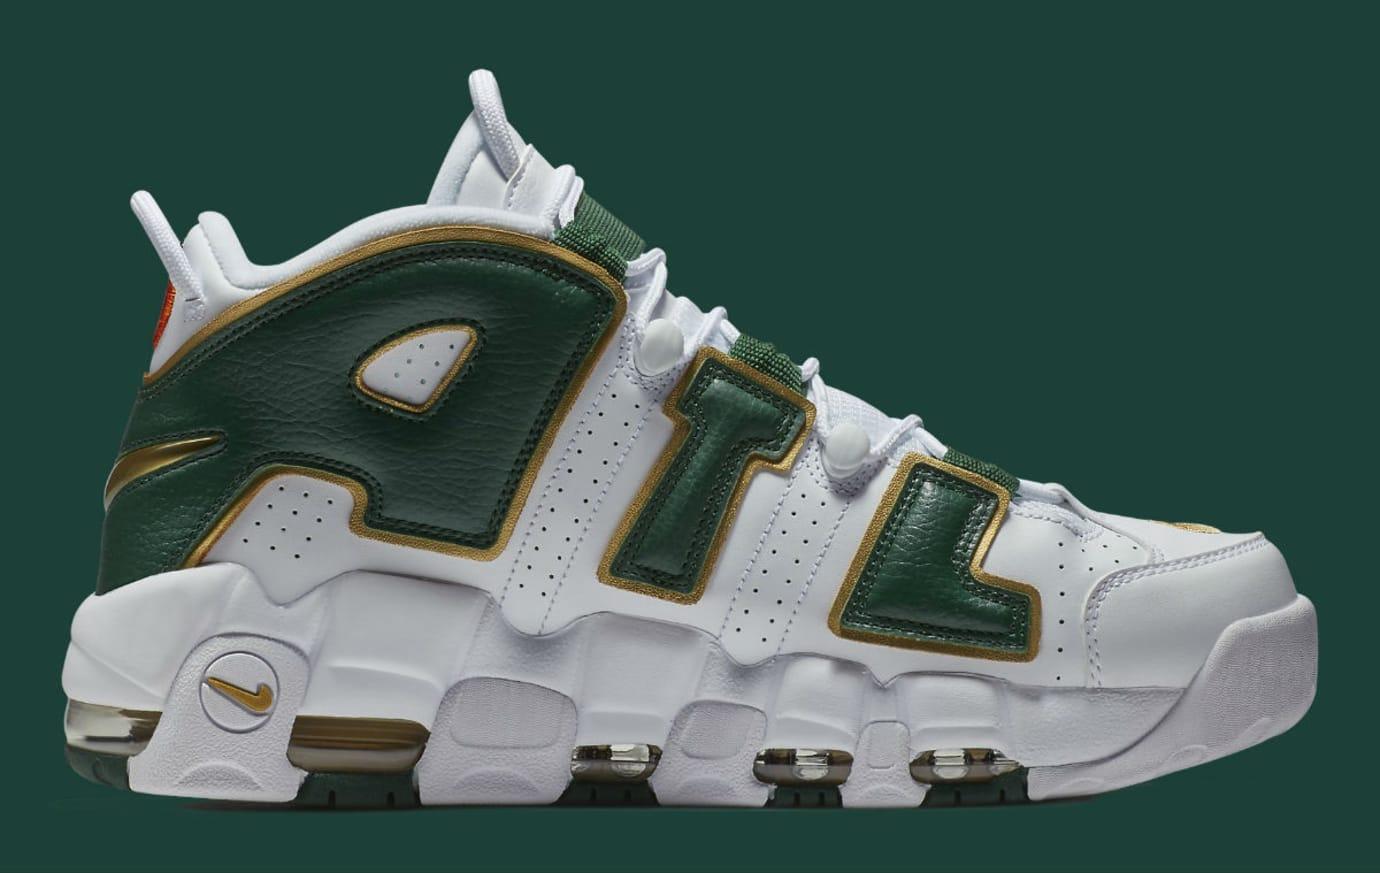 Nike Air More Uptempo Atlanta Release Date AJ3139-100 Medial